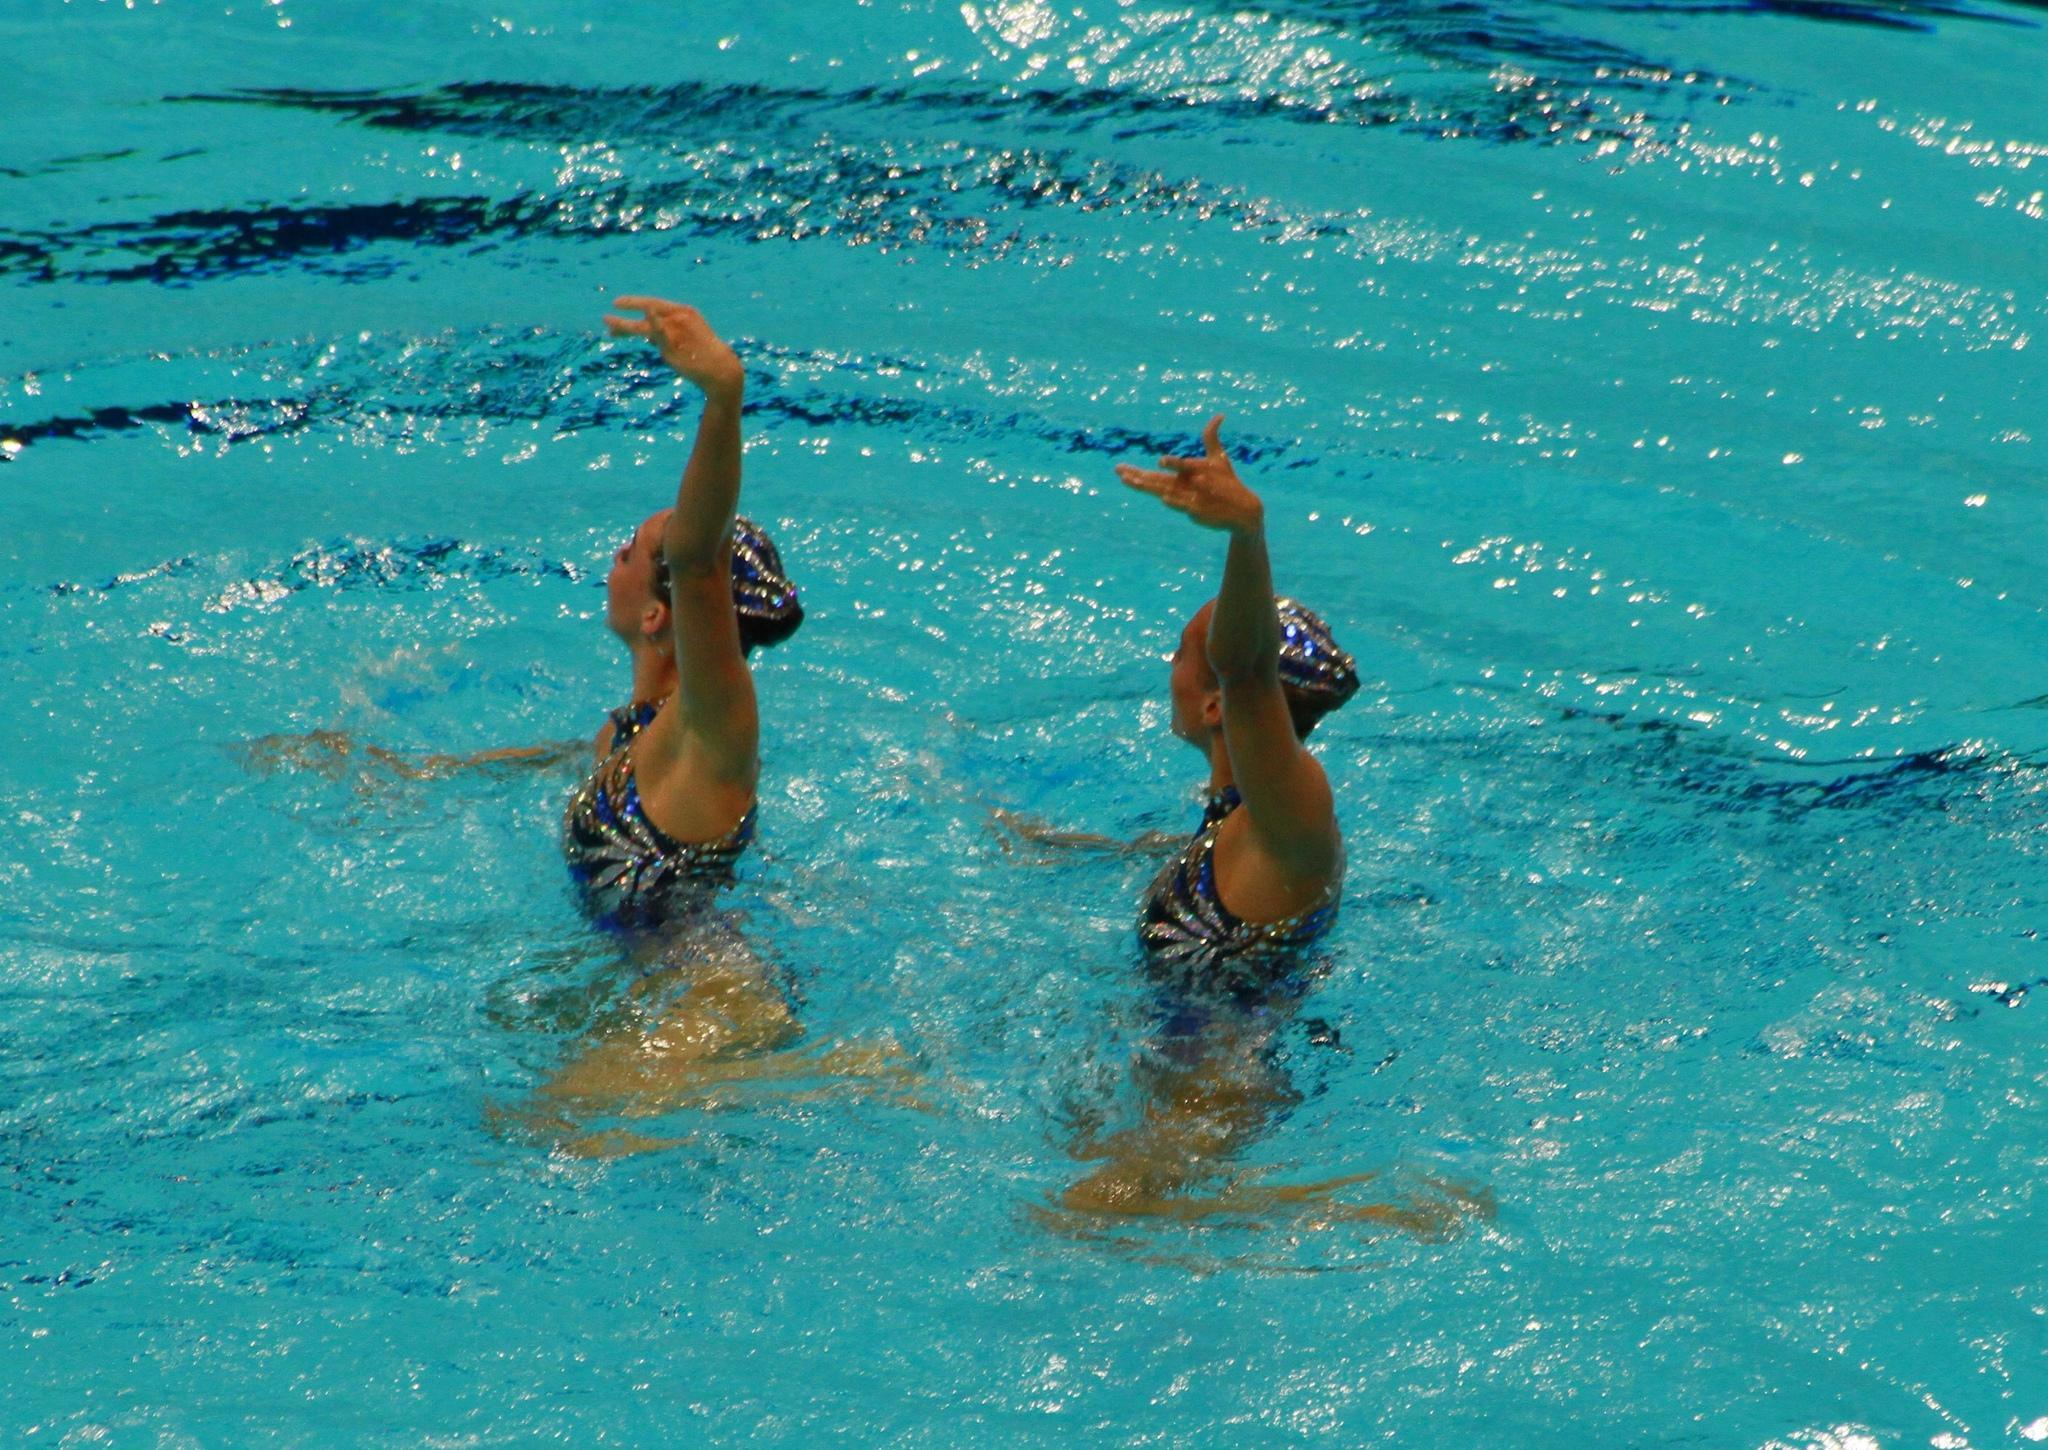 546834611_GreatBritainSynchronisedSwimming4_122_234lo.jpg